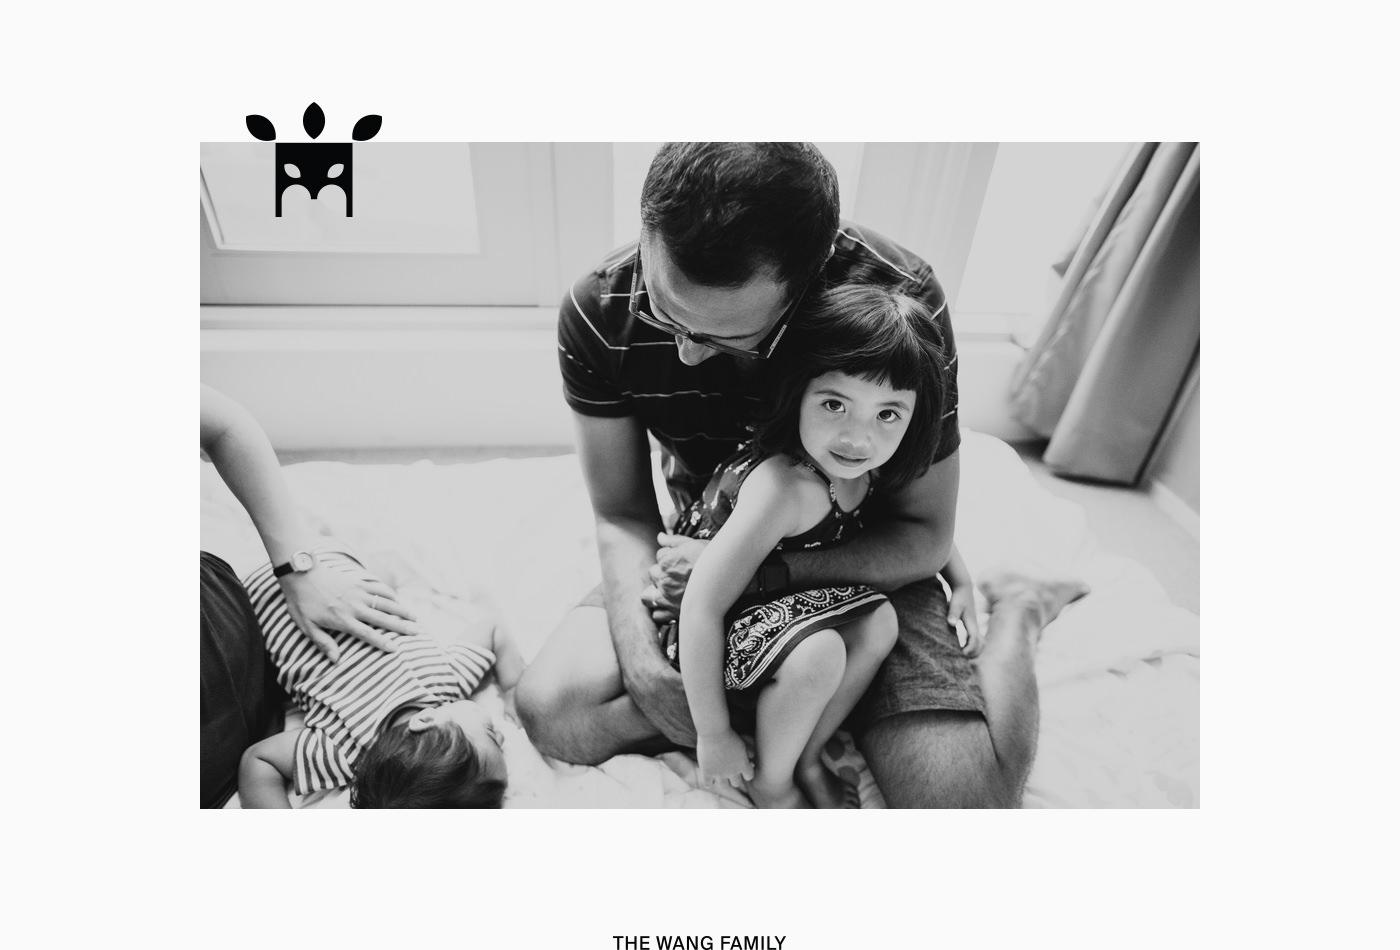 parikha-mehta-parikhamehta-photography-philadelphia-philly-family-editorial-pm-branding-brand-system-letterhead-invoice-vacaliebres-wang1